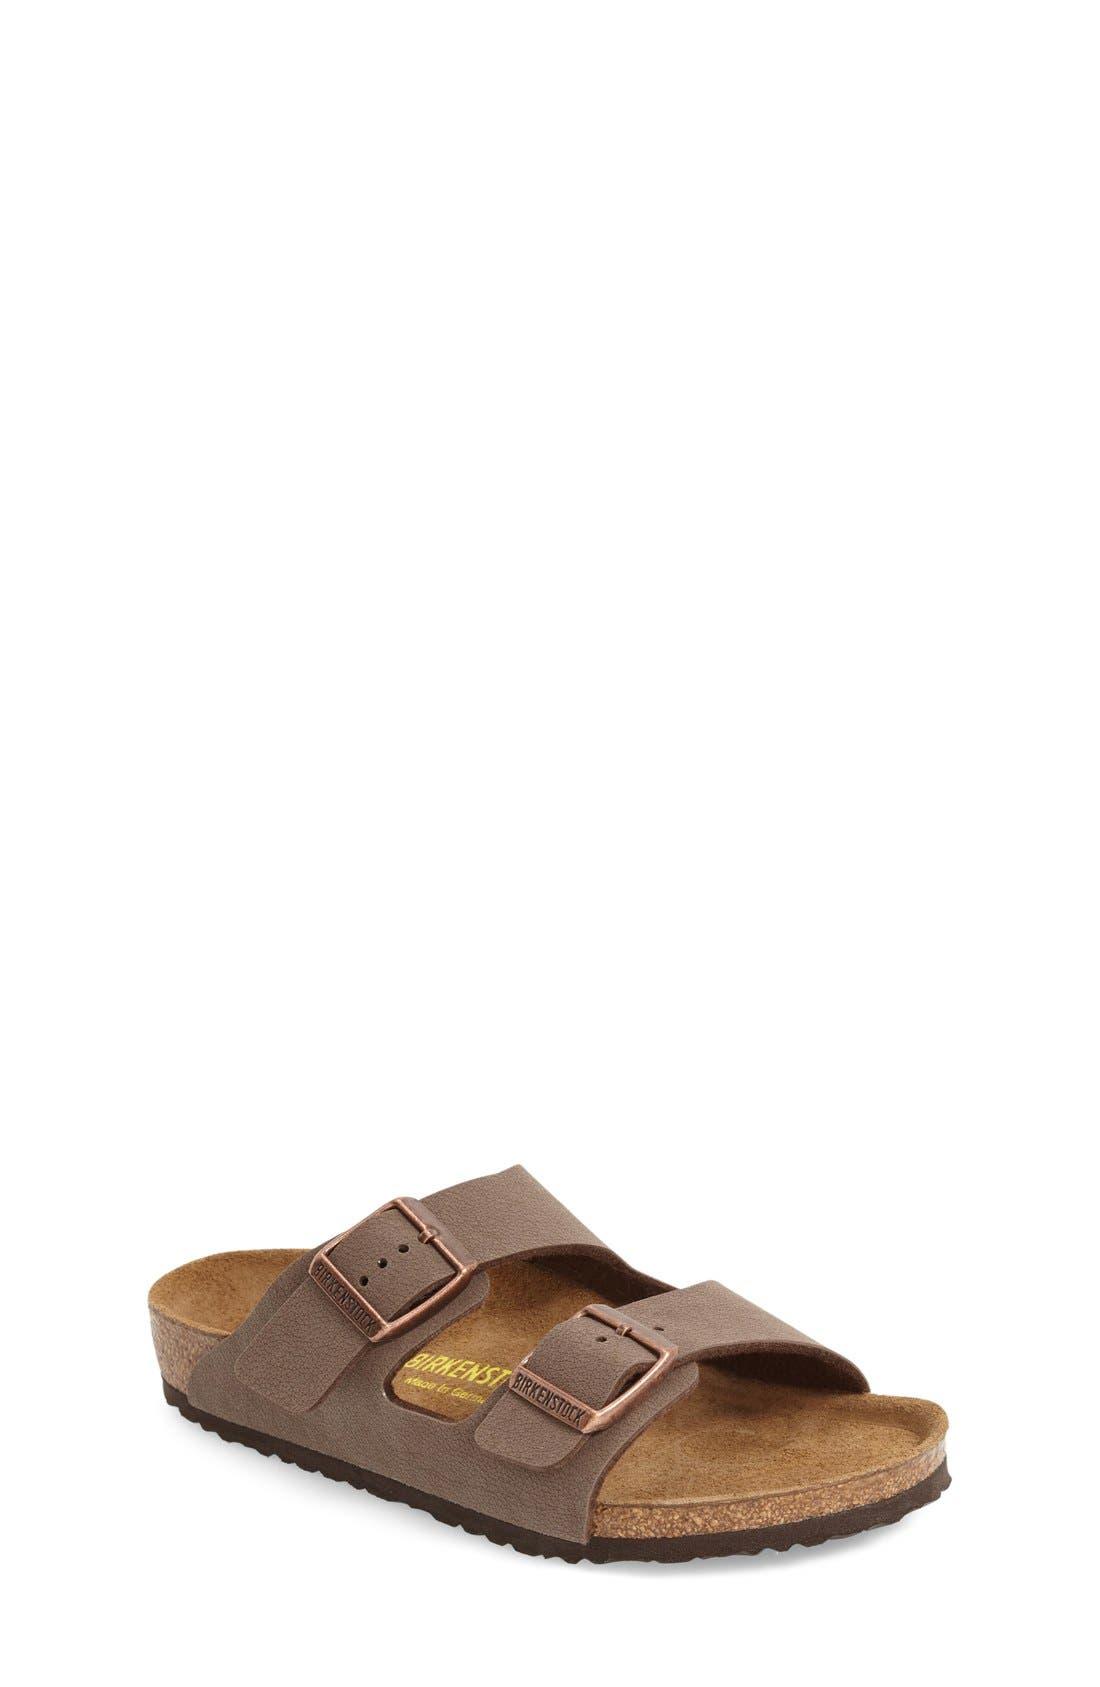 BIRKENSTOCK 'Arizona' Suede Sandal, Main, color, MOCHA